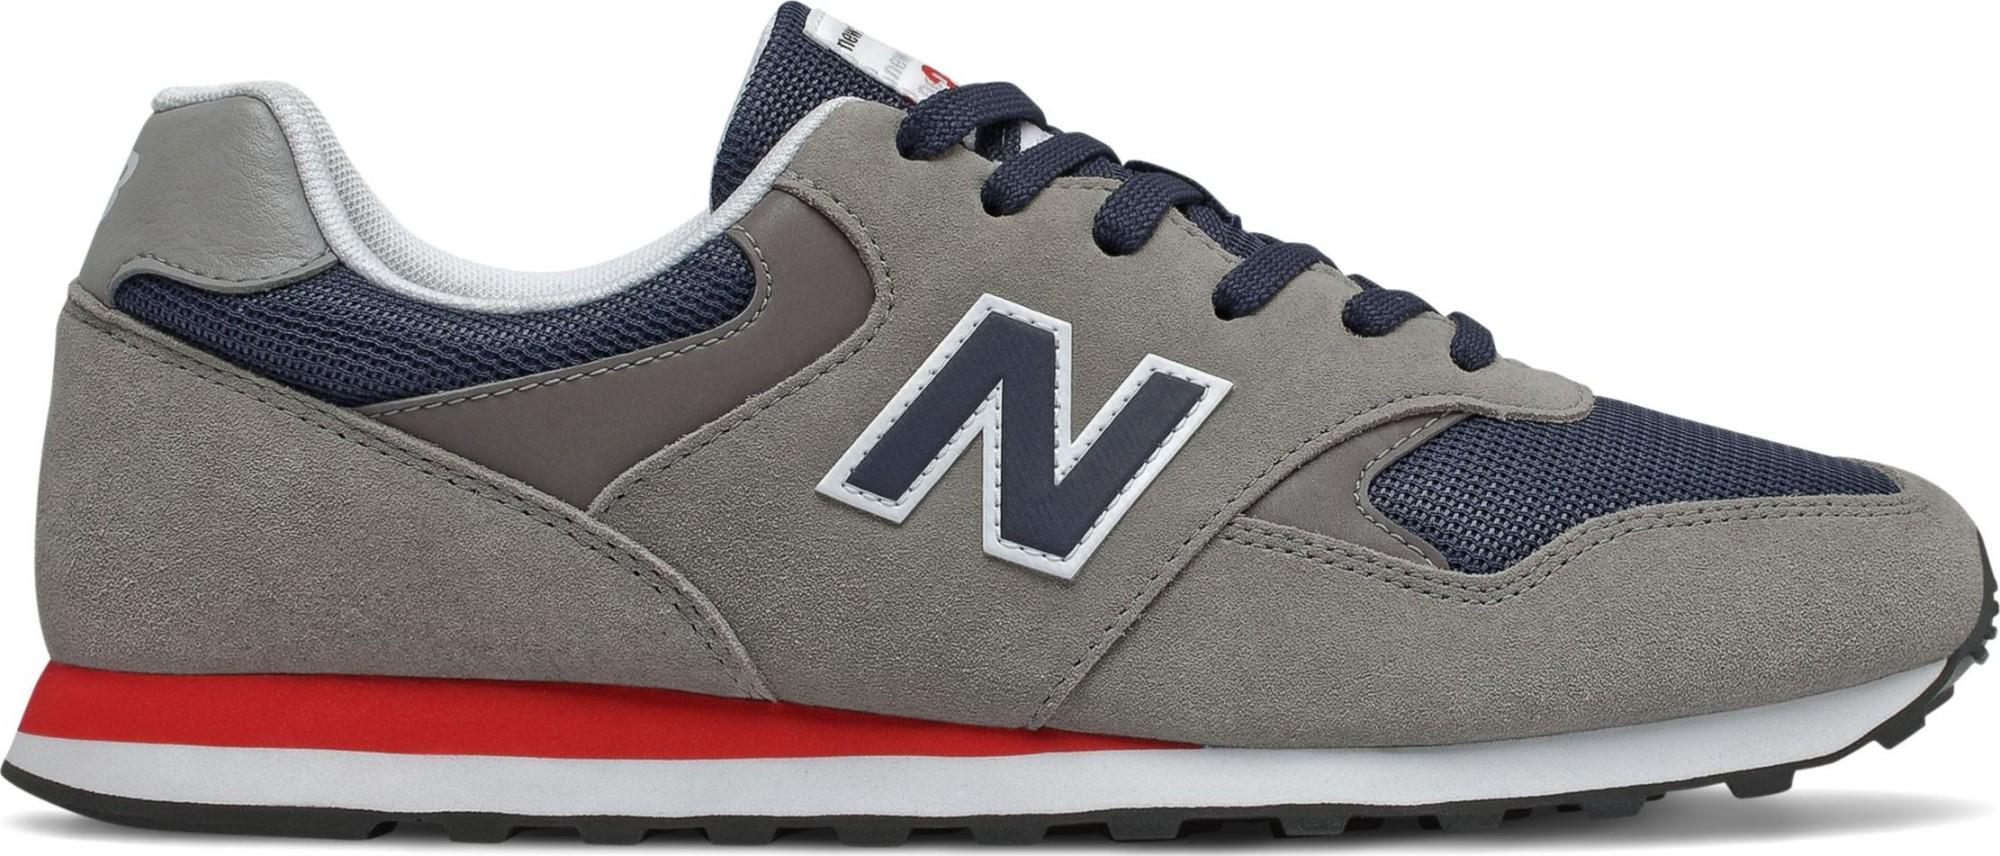 New Balance ML393 Grey SH1 42